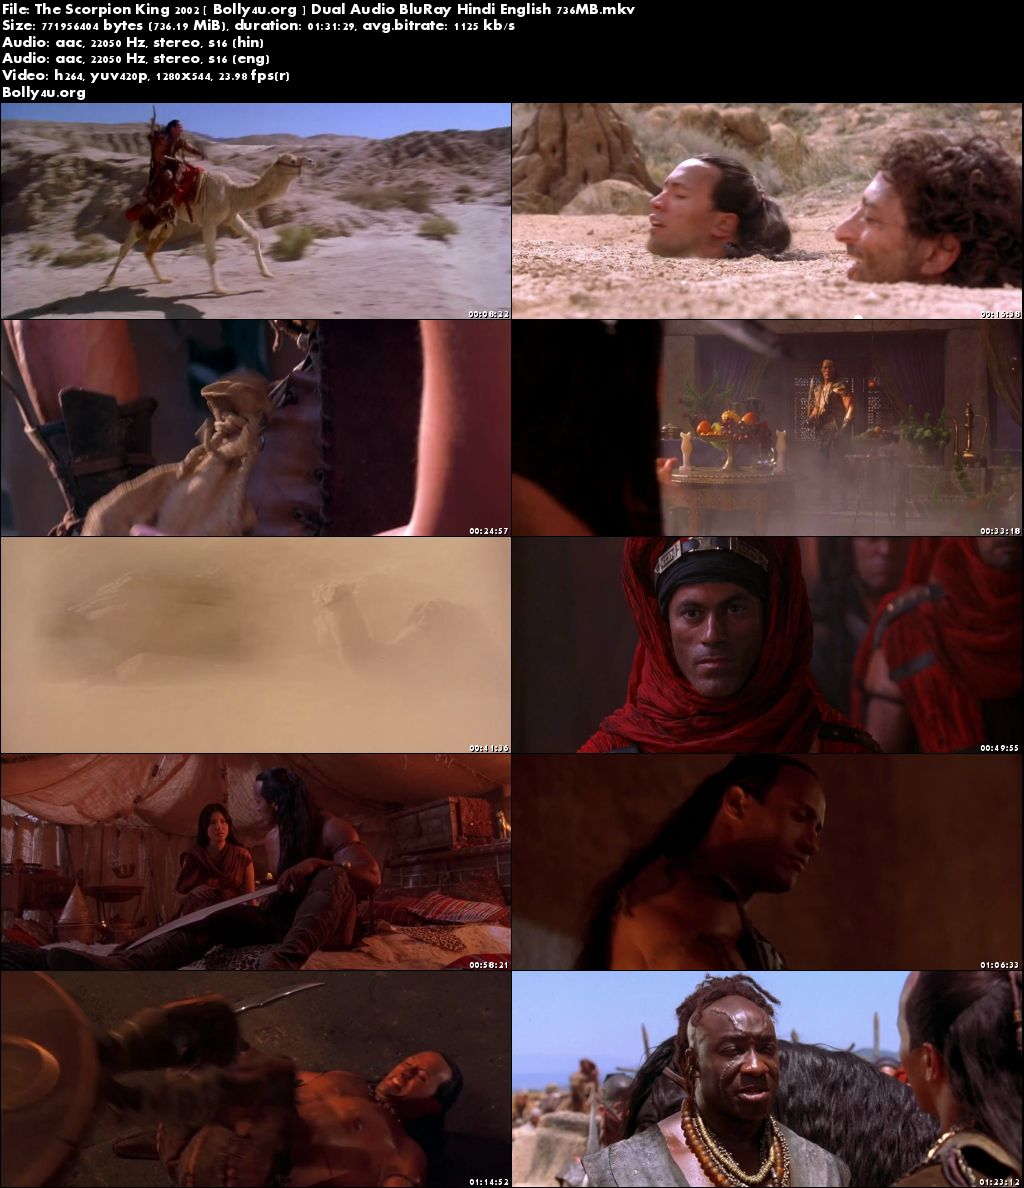 The Scorpion King 2002 BluRay 700MB Hindi Dual Audio 720p Download